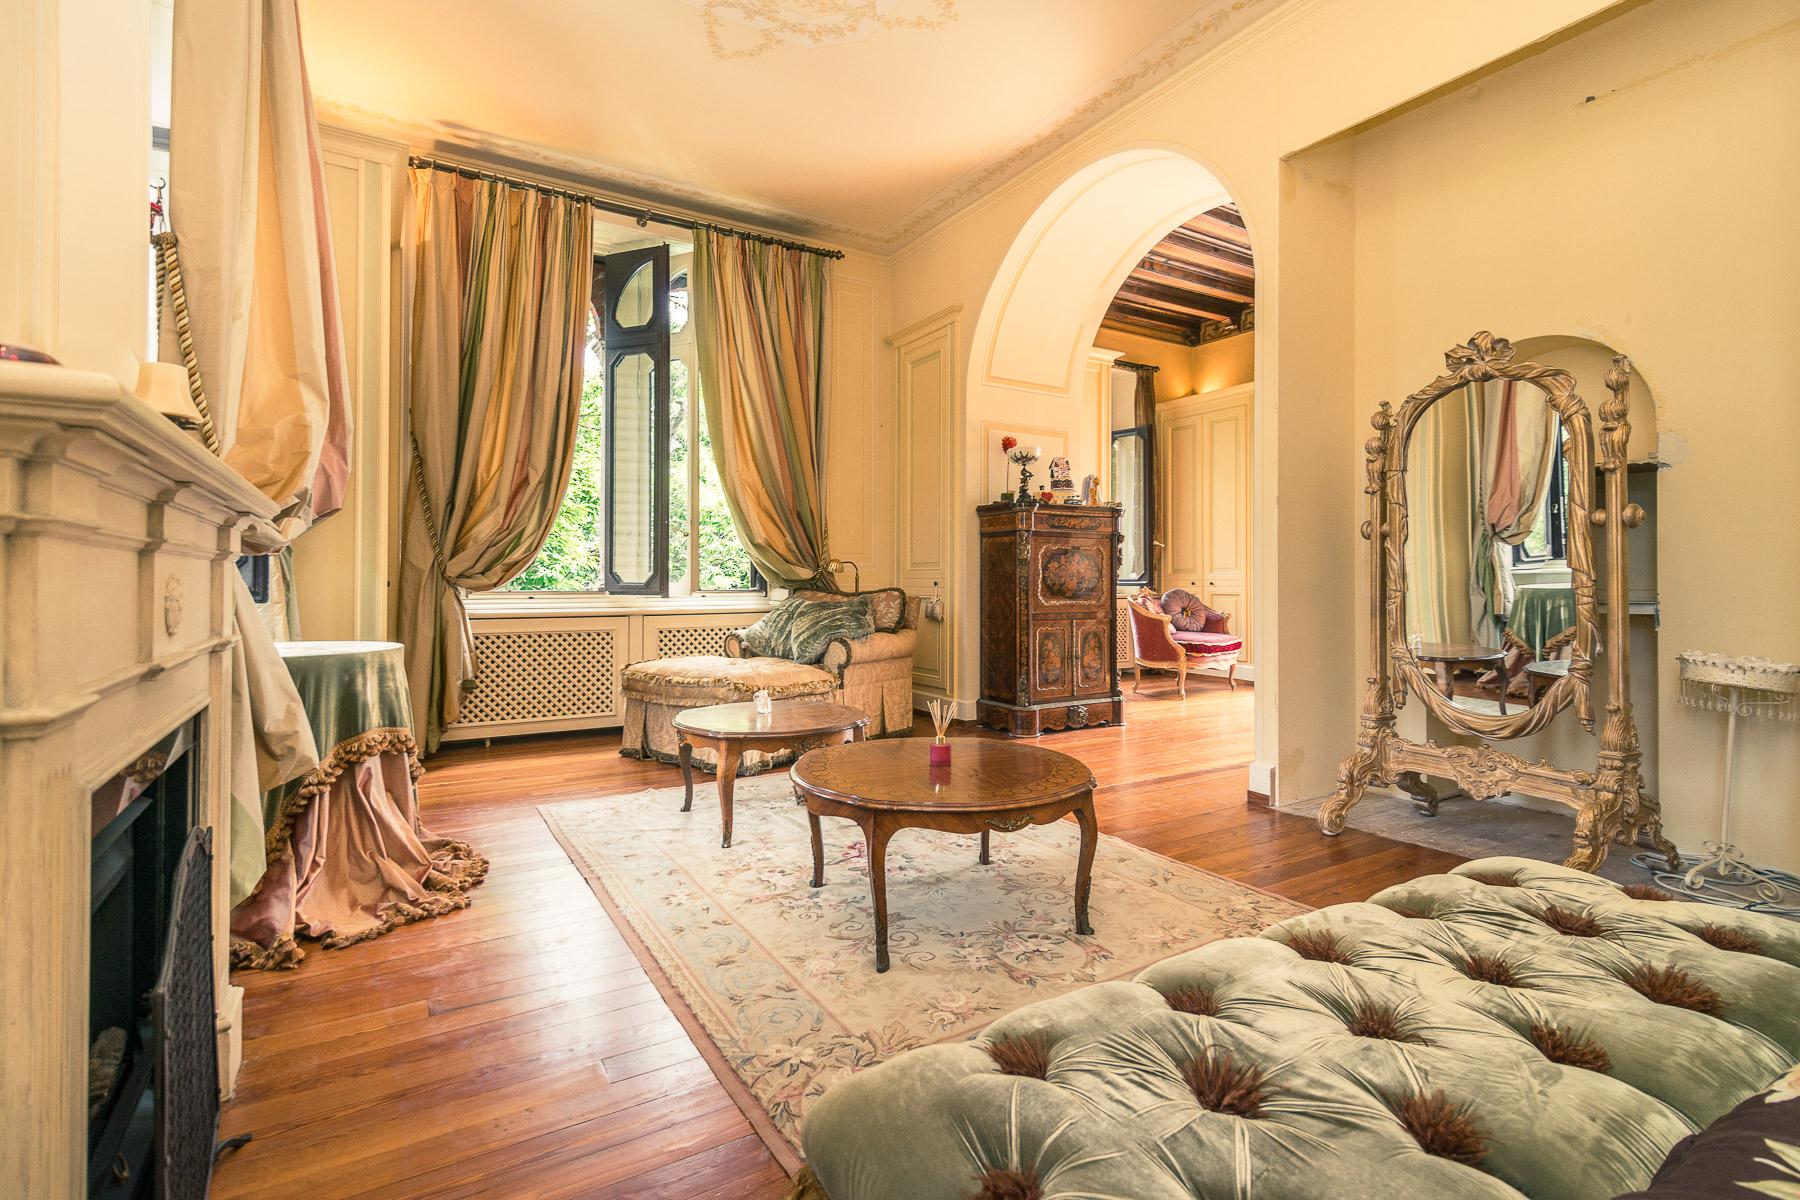 Villa in Vendita a Varese: 5 locali, 1150 mq - Foto 17